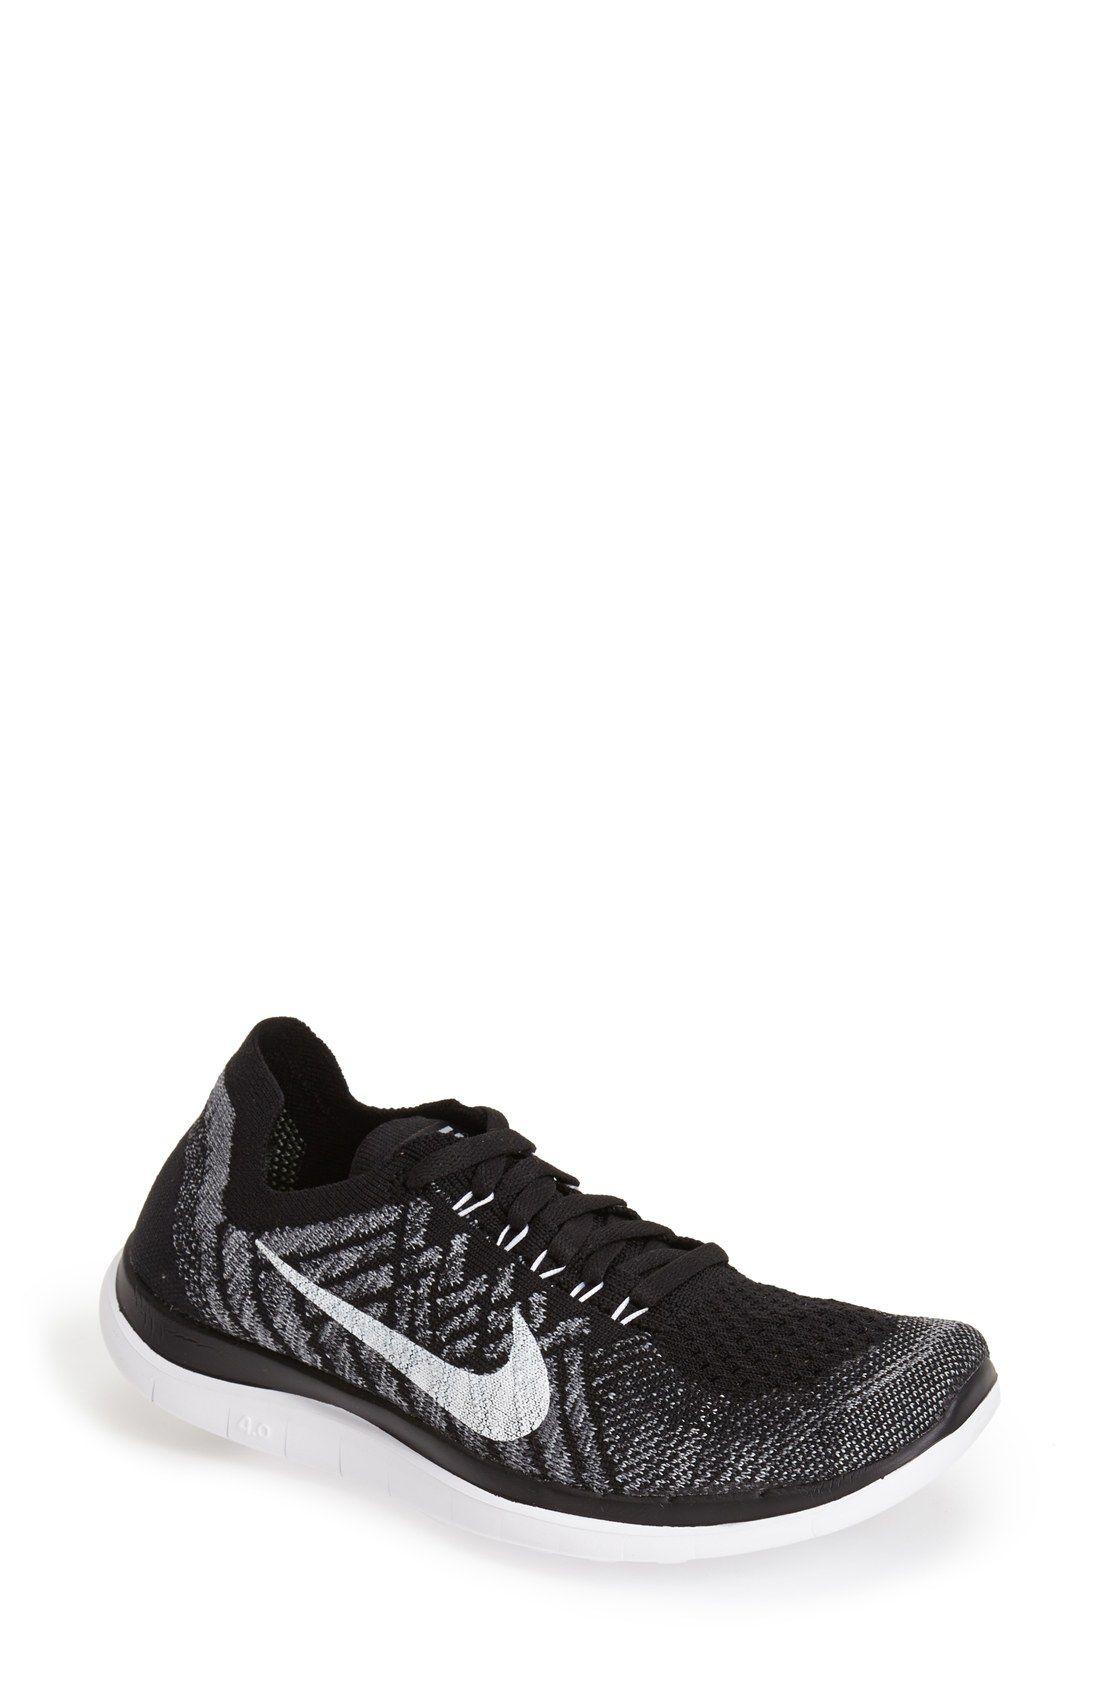 Nike  Free 4.0 Flyknit  Running Shoe (Women)  904be31841